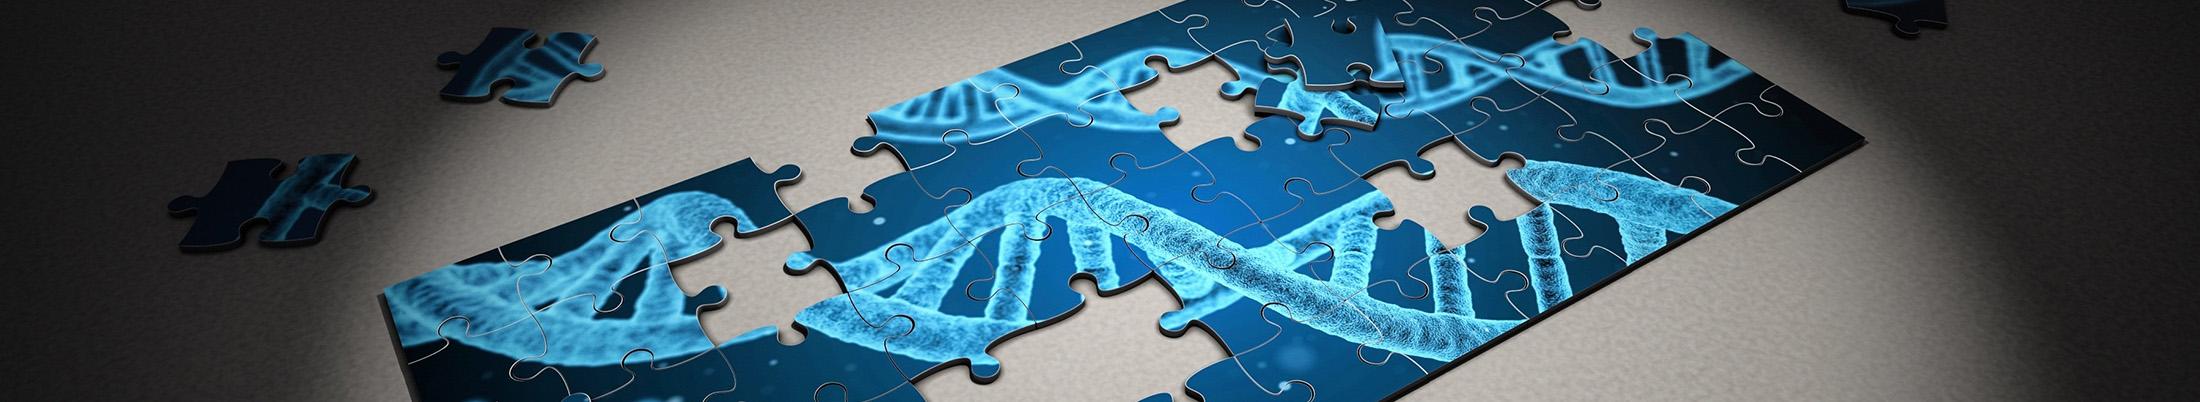 TRanslational Bioinformatics banner image